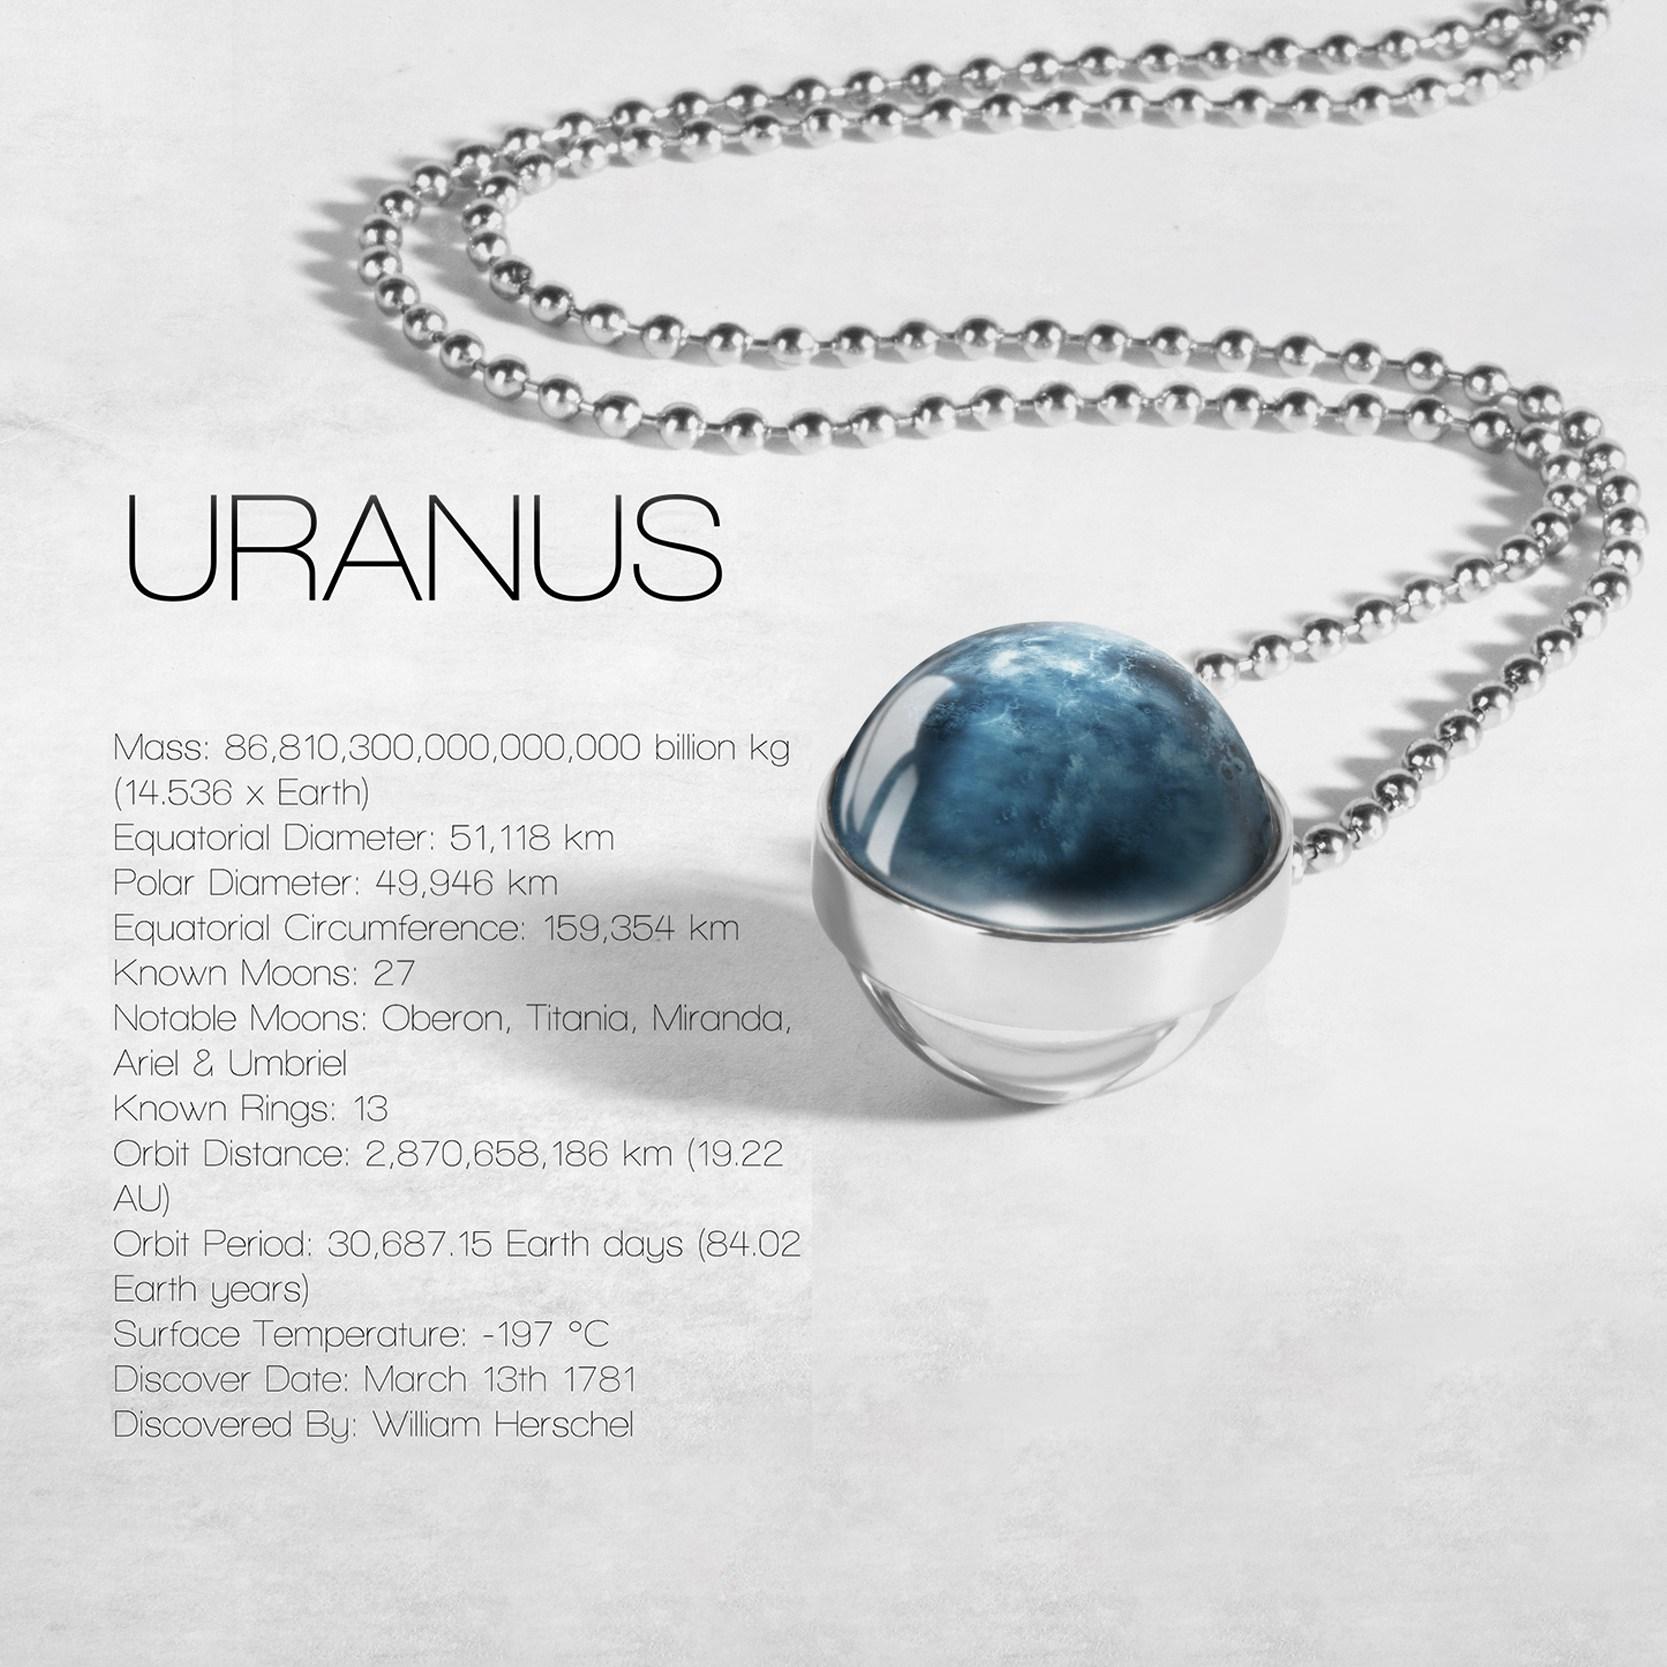 Globe Double Sided Necklace Solar System Planet Venus Mercury Mars Saturn Uranus Neptune Earth Sun Pendant Dome Glass Necklaces 9